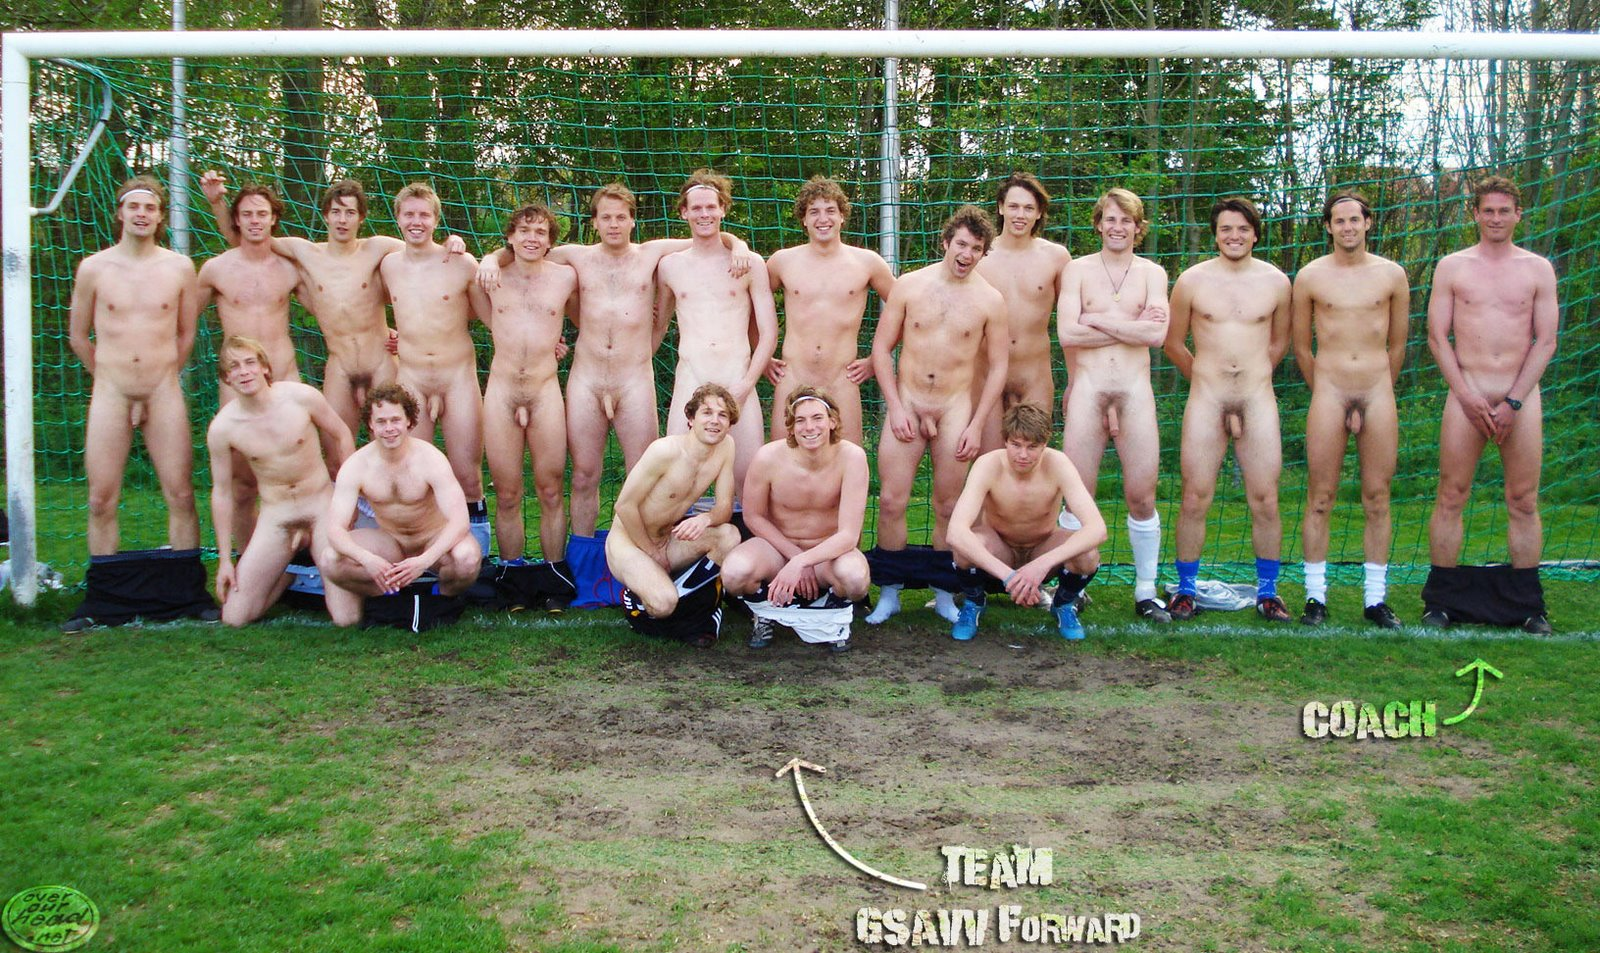 Oc college cheerleaders nude